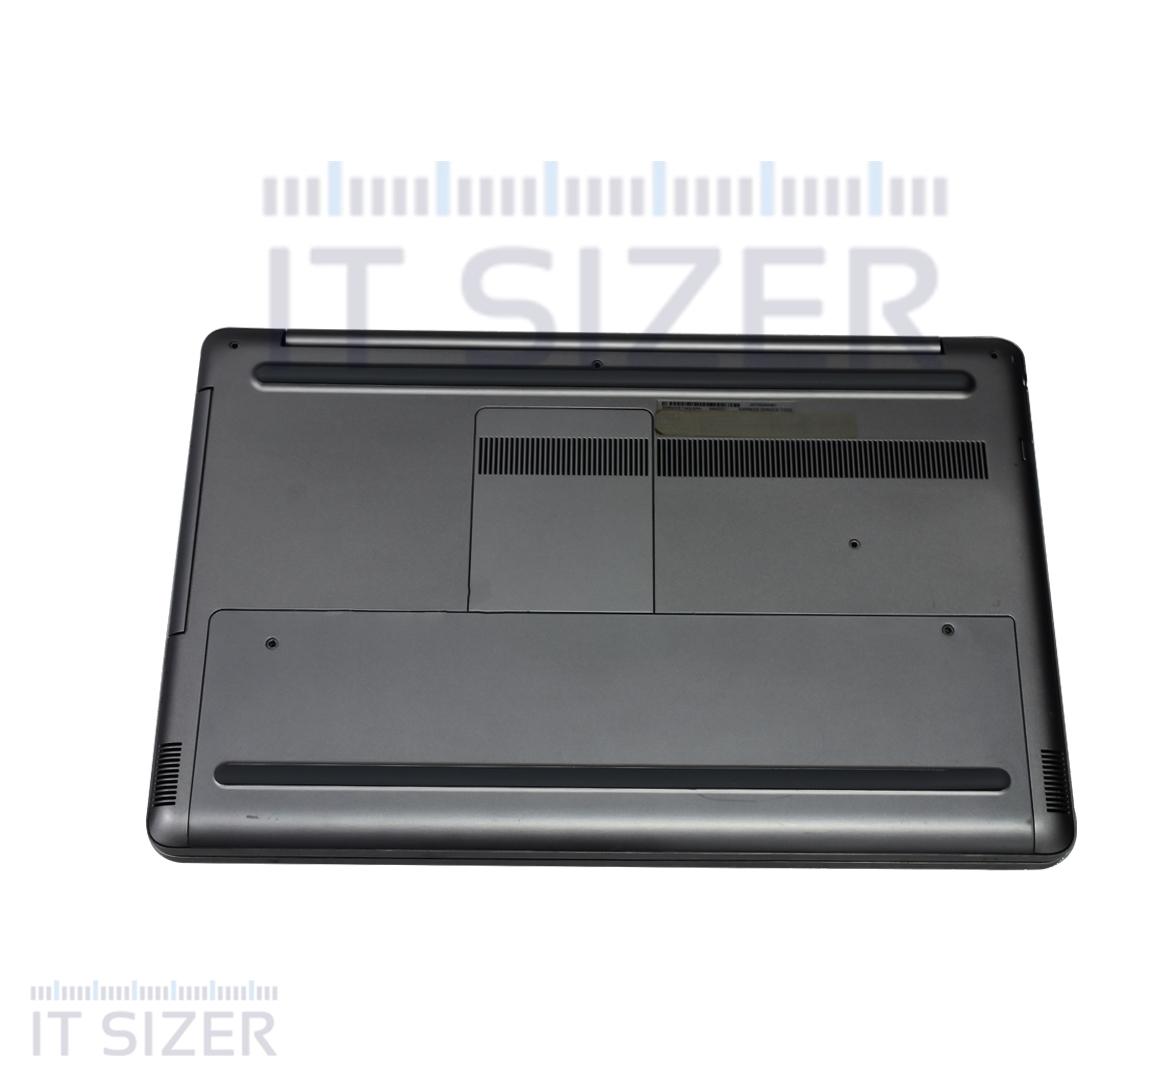 Dell Inspiron 17 7000 series 7737 Business Laptop, Intel Core i7-4500U CPU, 8GB DDR3L SODIMM RAM, 256GB SSD 2.5, 17 inch Touch Display, Windows 10 Pro (Renewed)